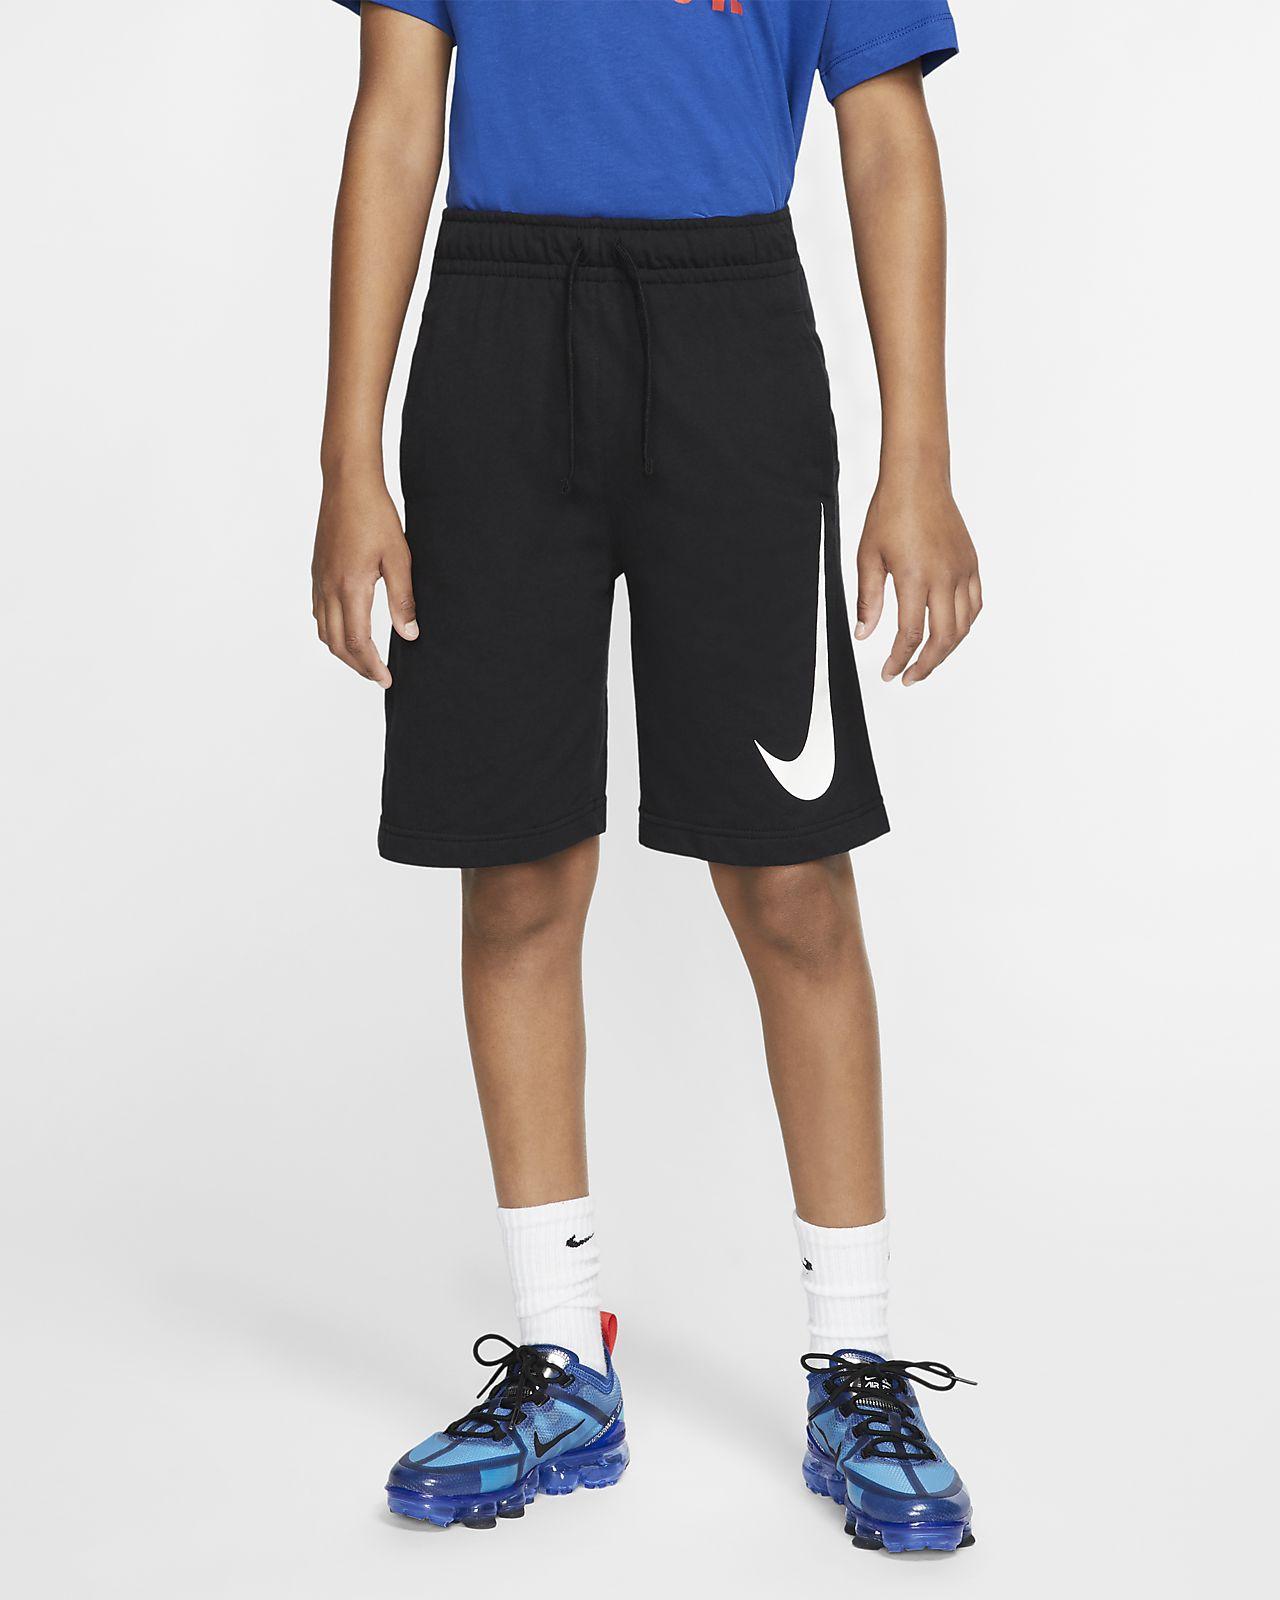 Nike Sportswear Pantalons curts de teixit French Terry - Nen